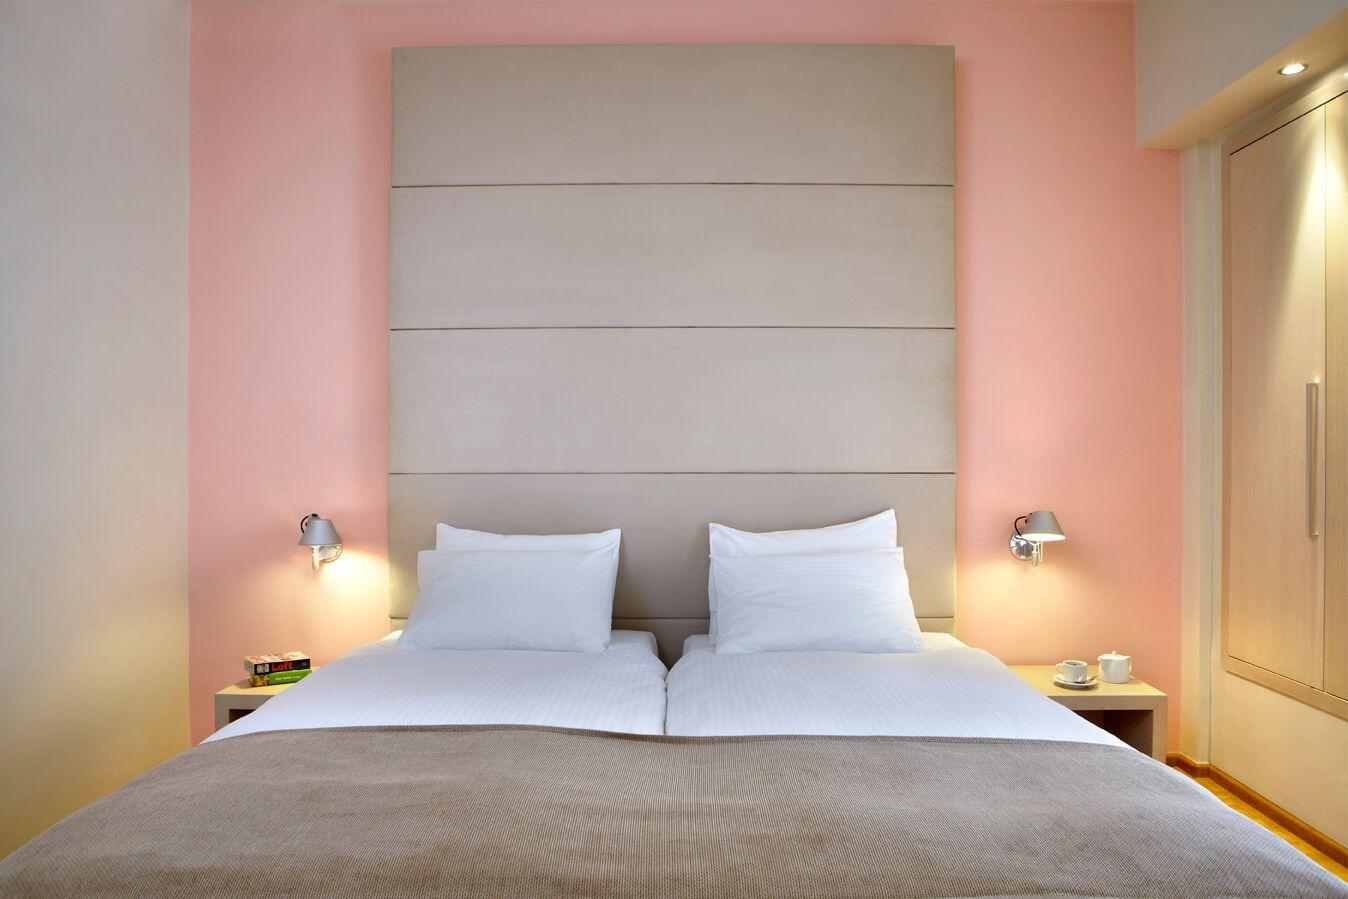 olympia accommodation